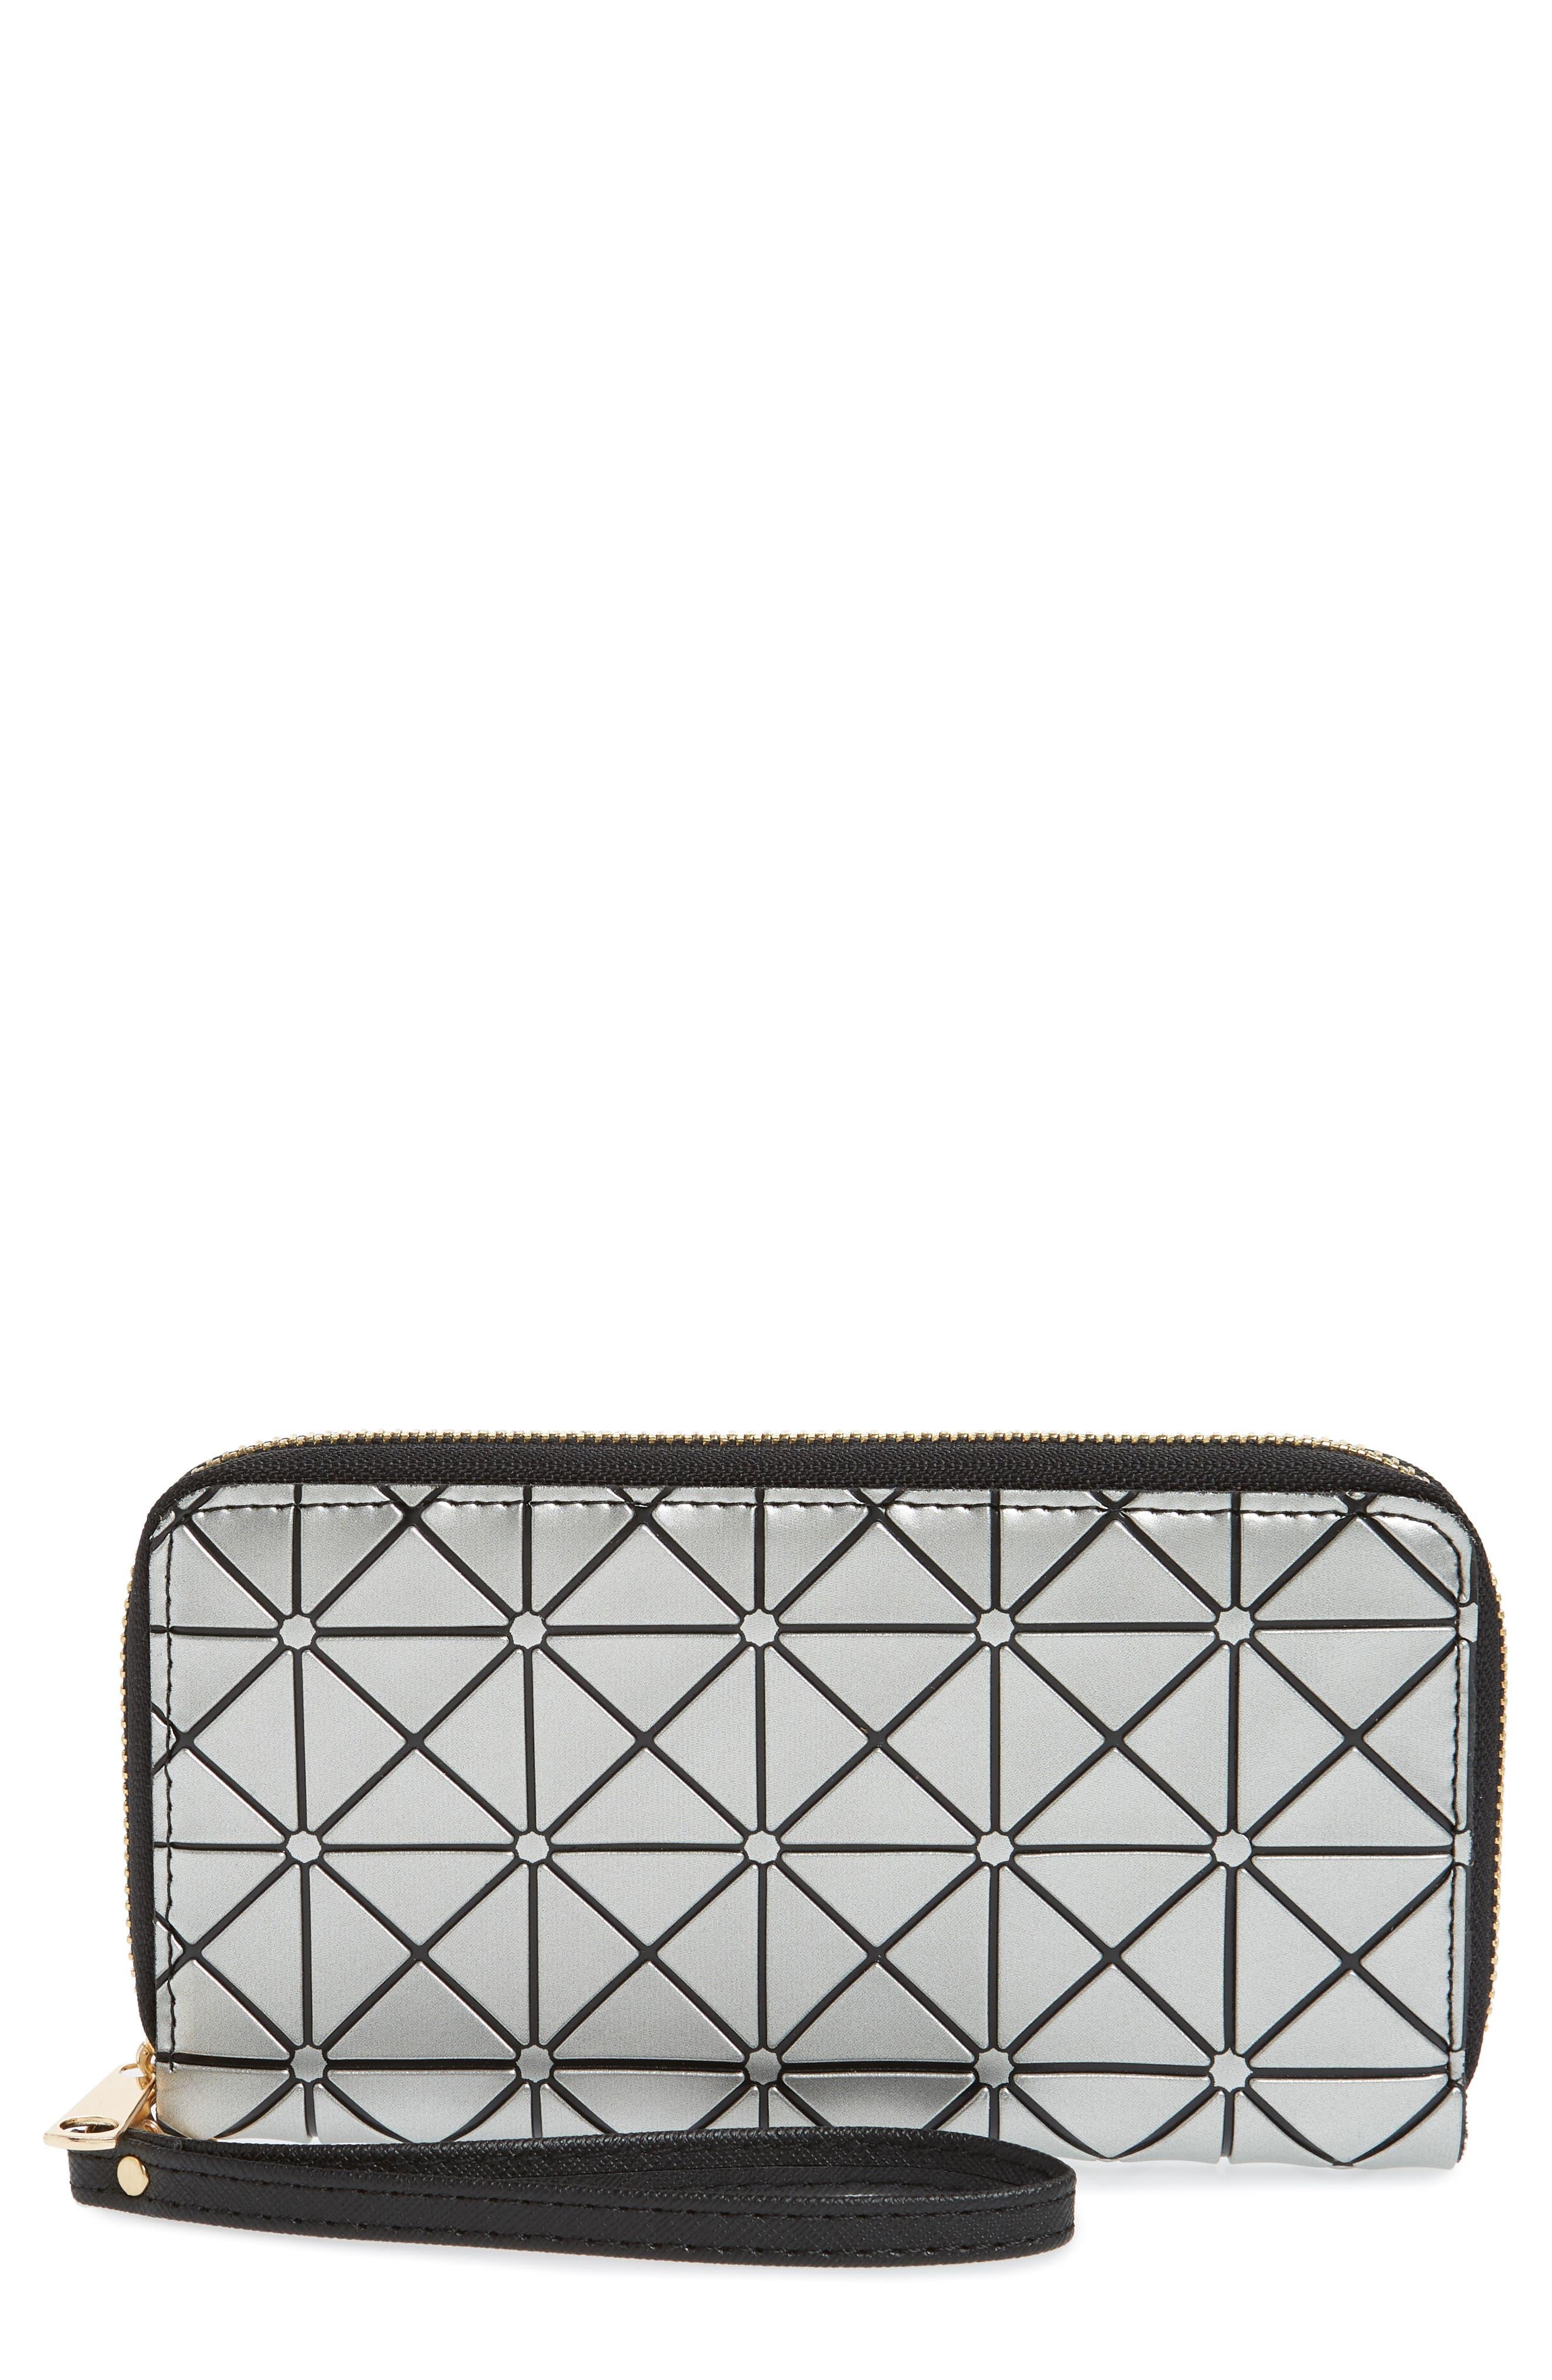 YOKI BAGS Diamond Embossed Faux Leather Zip Wallet, Main, color, 040